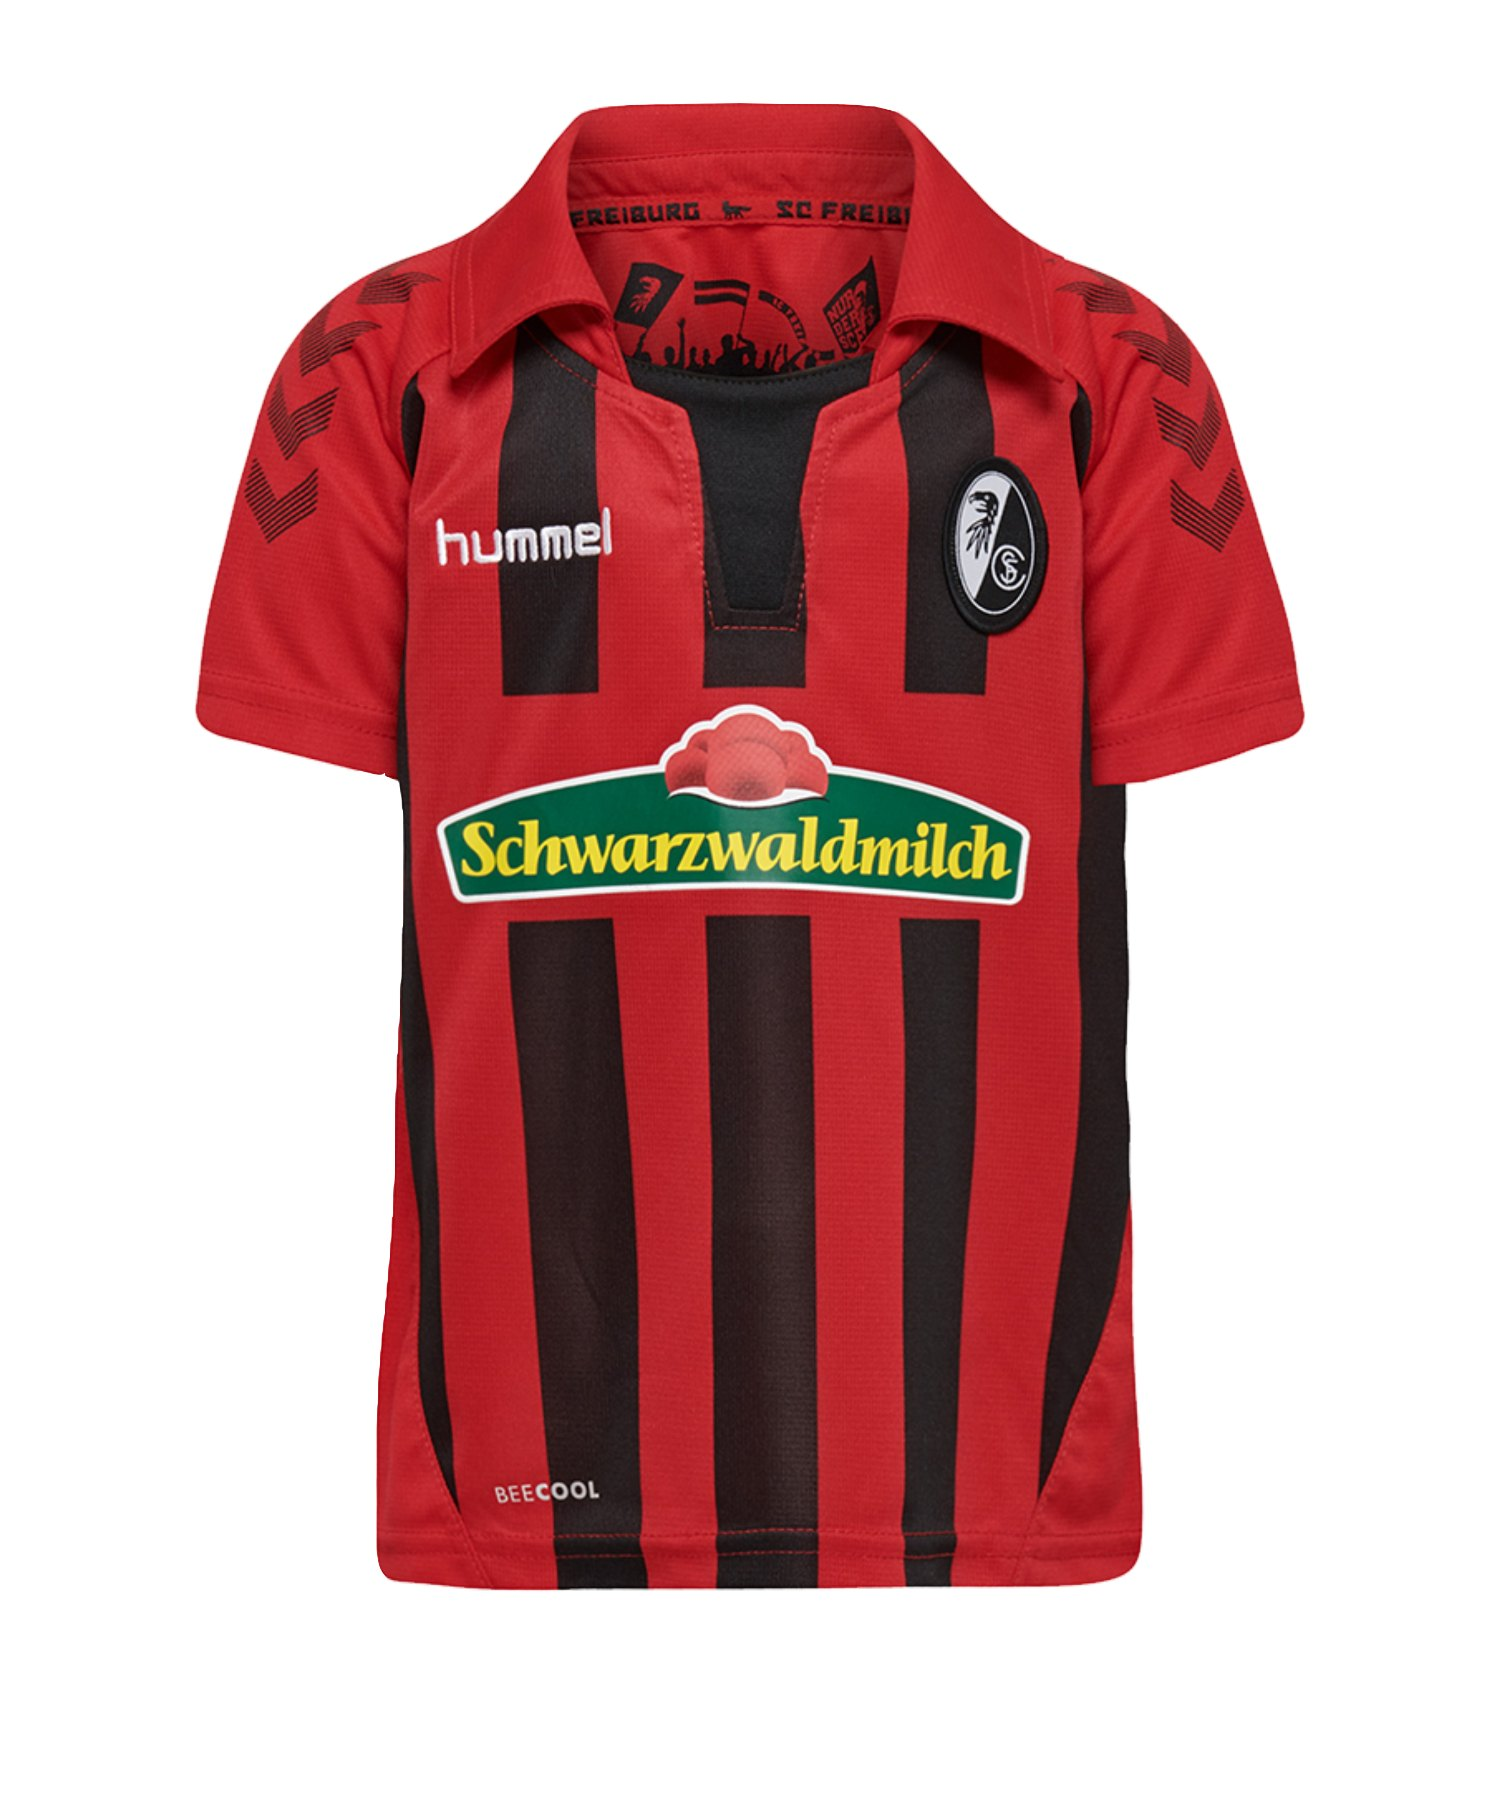 Hummel SC Freiburg Trikot Home 2019/2020 Kids Rot F3081 - rot